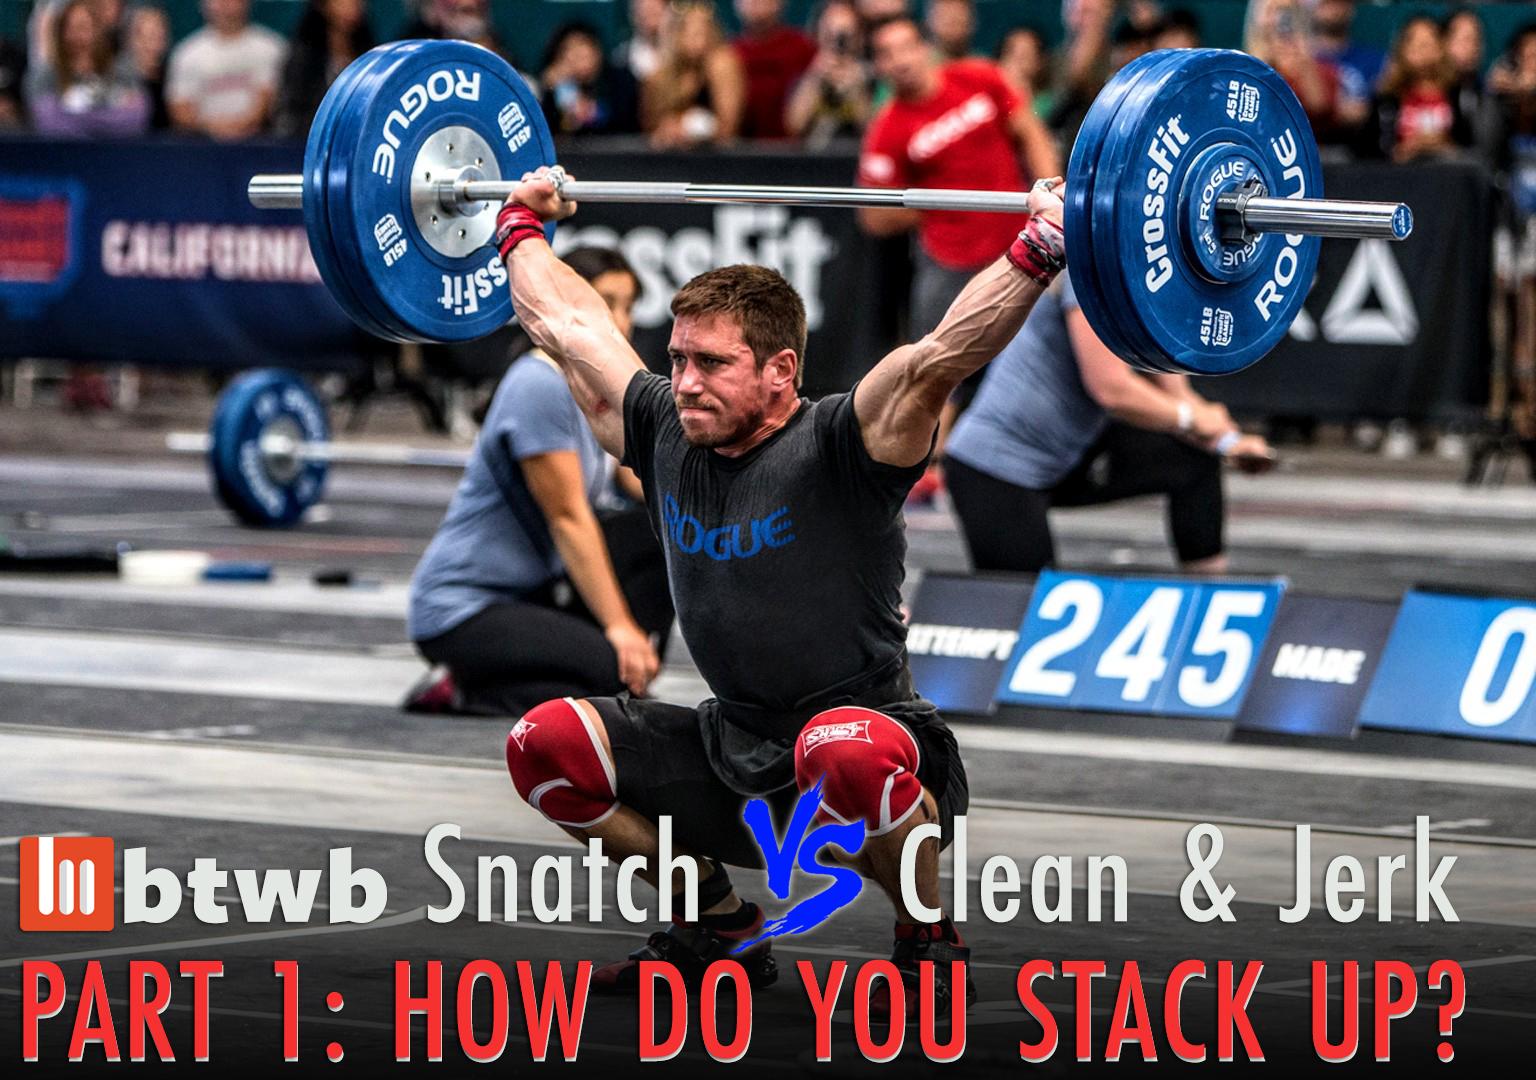 Snatch vs Clean & Jerk Part 1: How Do You Stack Up? – btwb blog